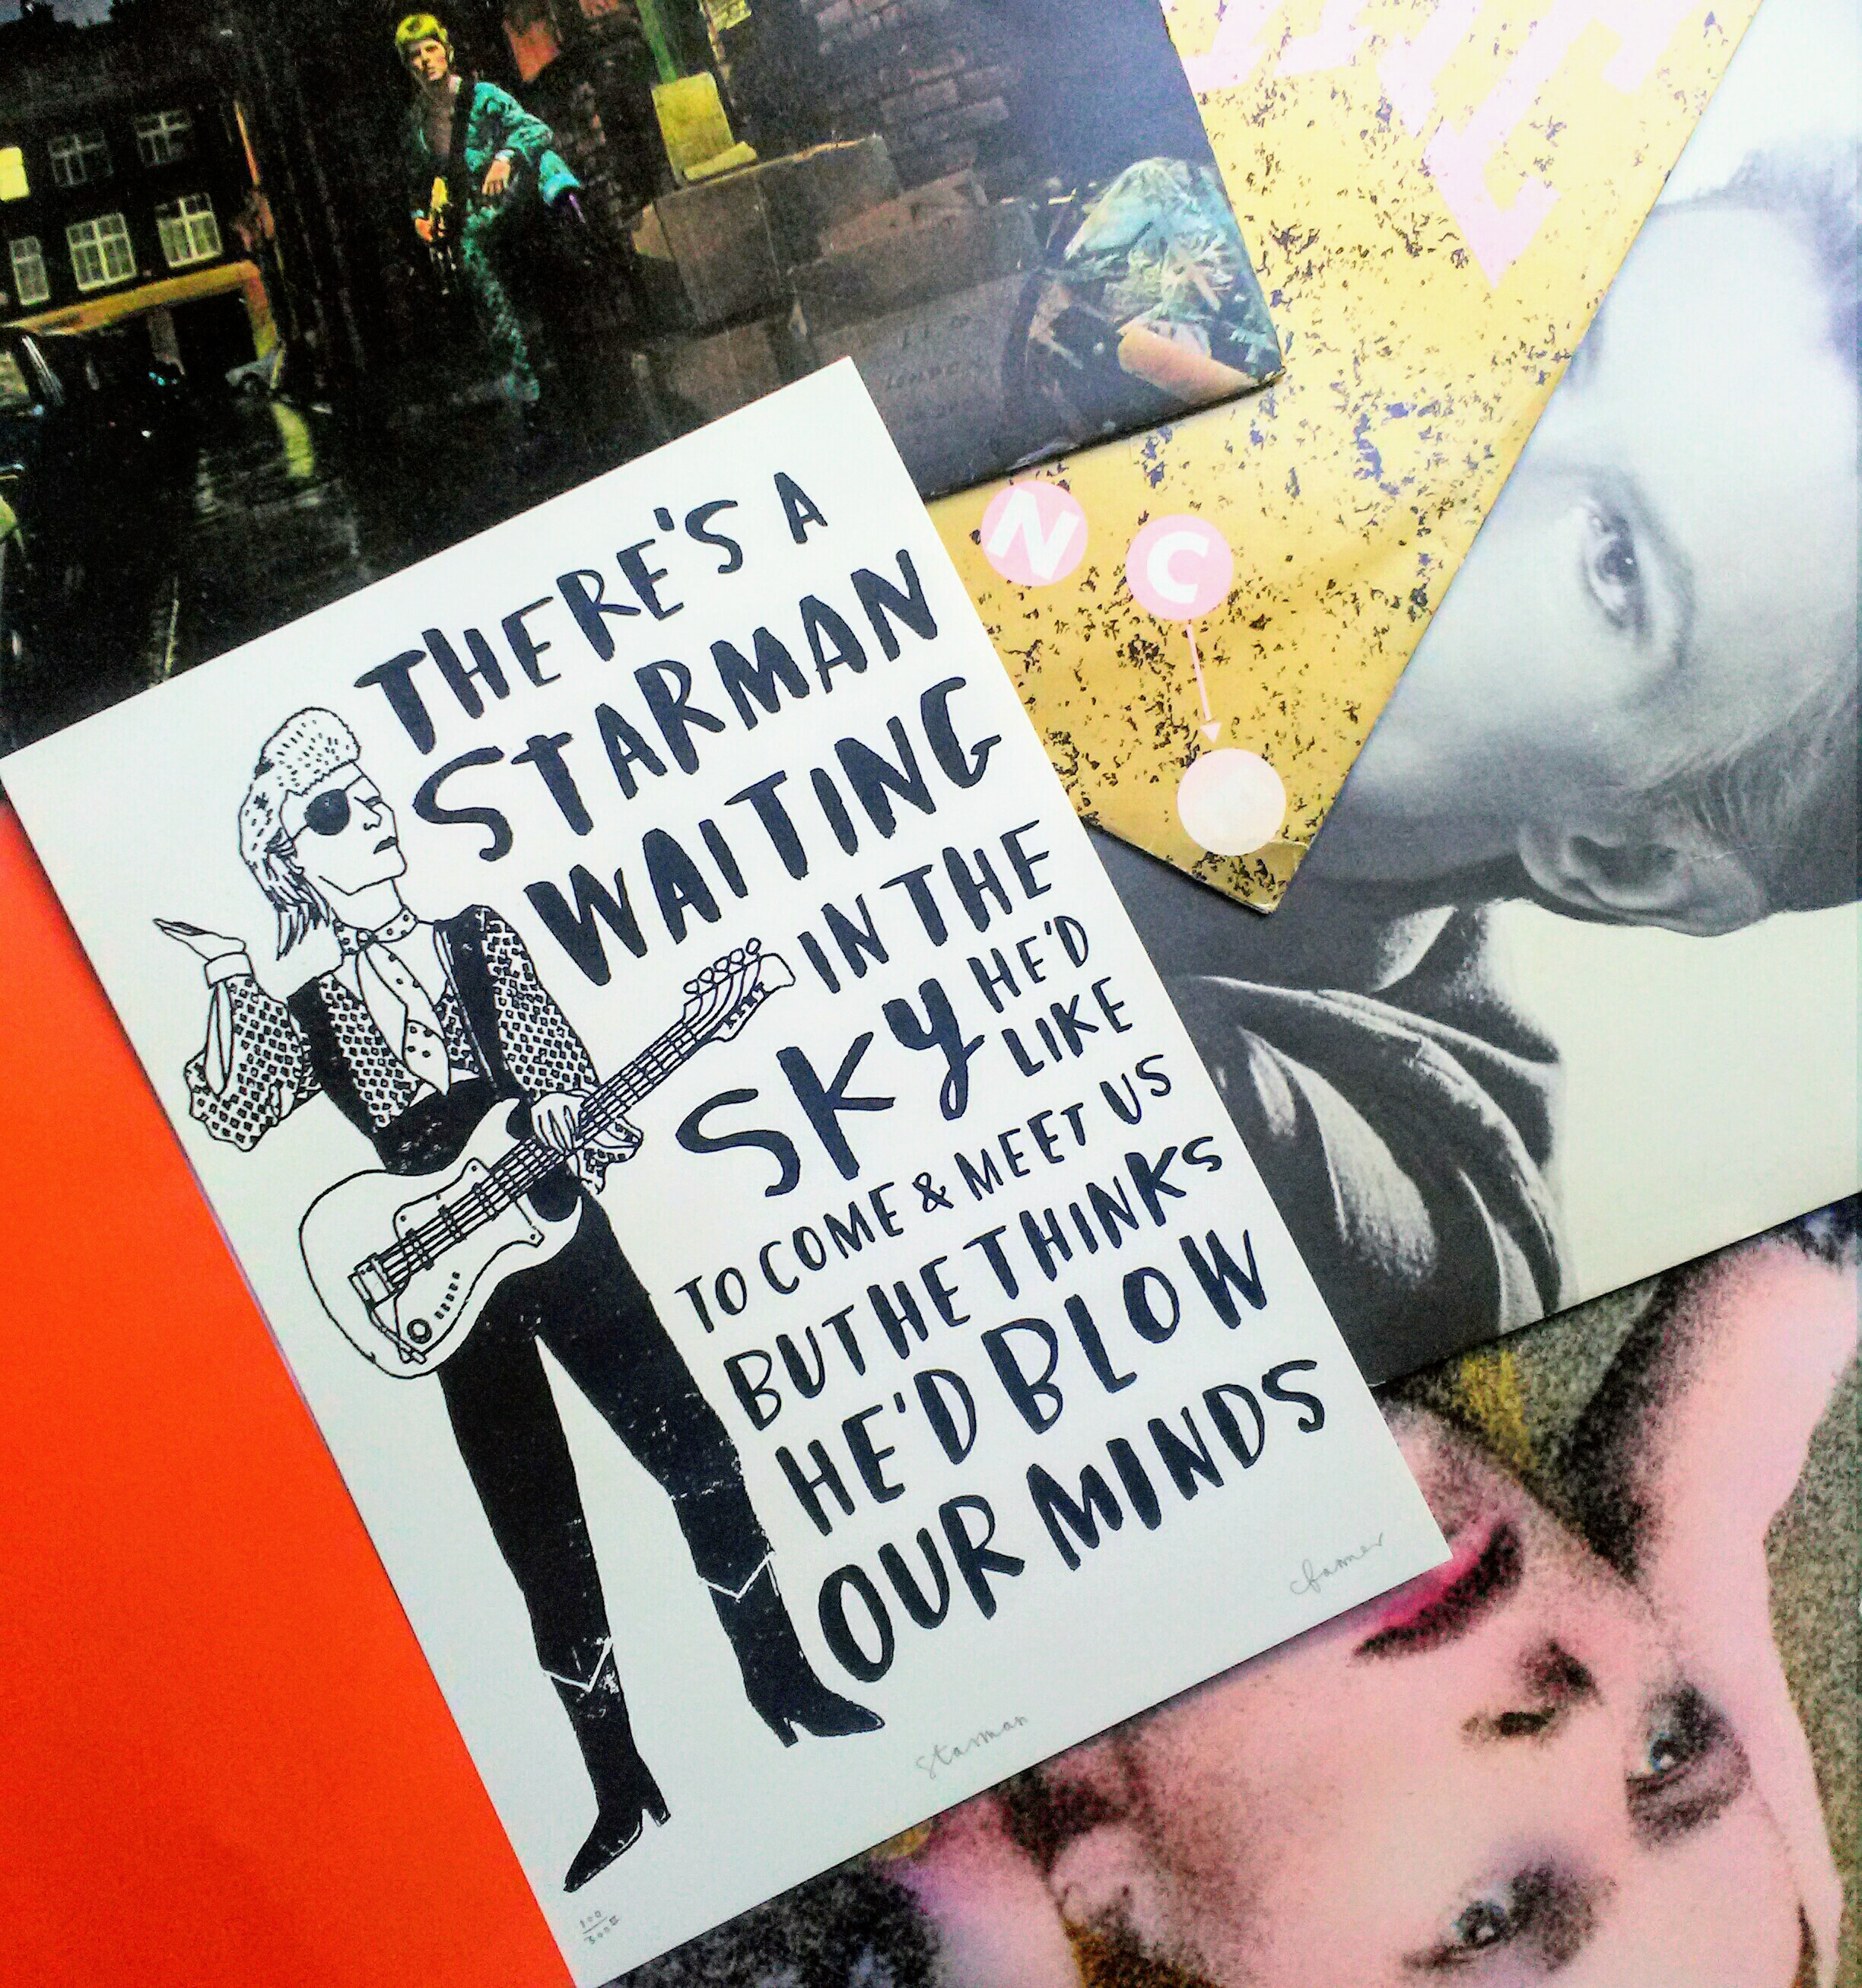 David Bowie print amongst David Bowie records